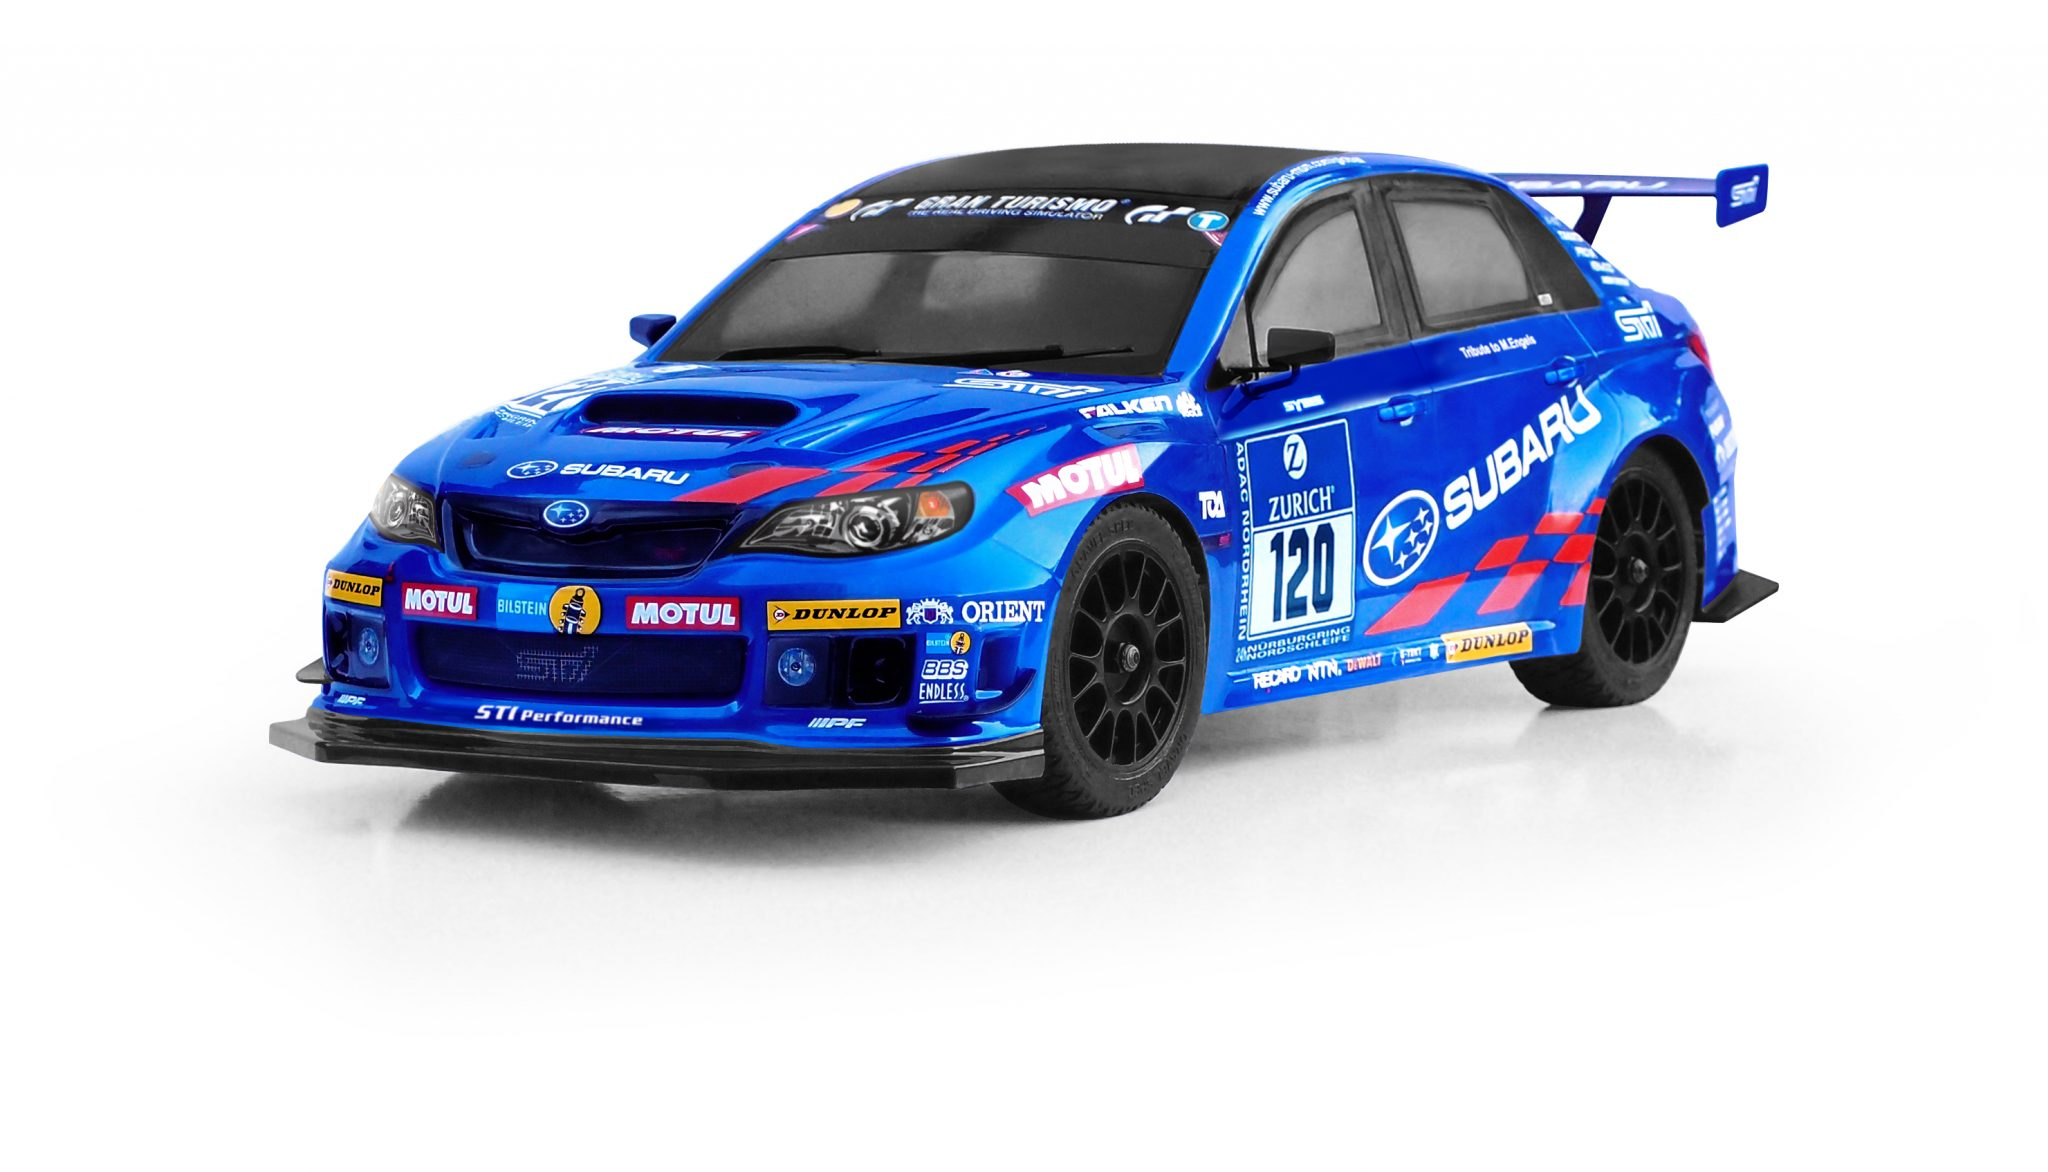 A Subaru WRX with Carisma